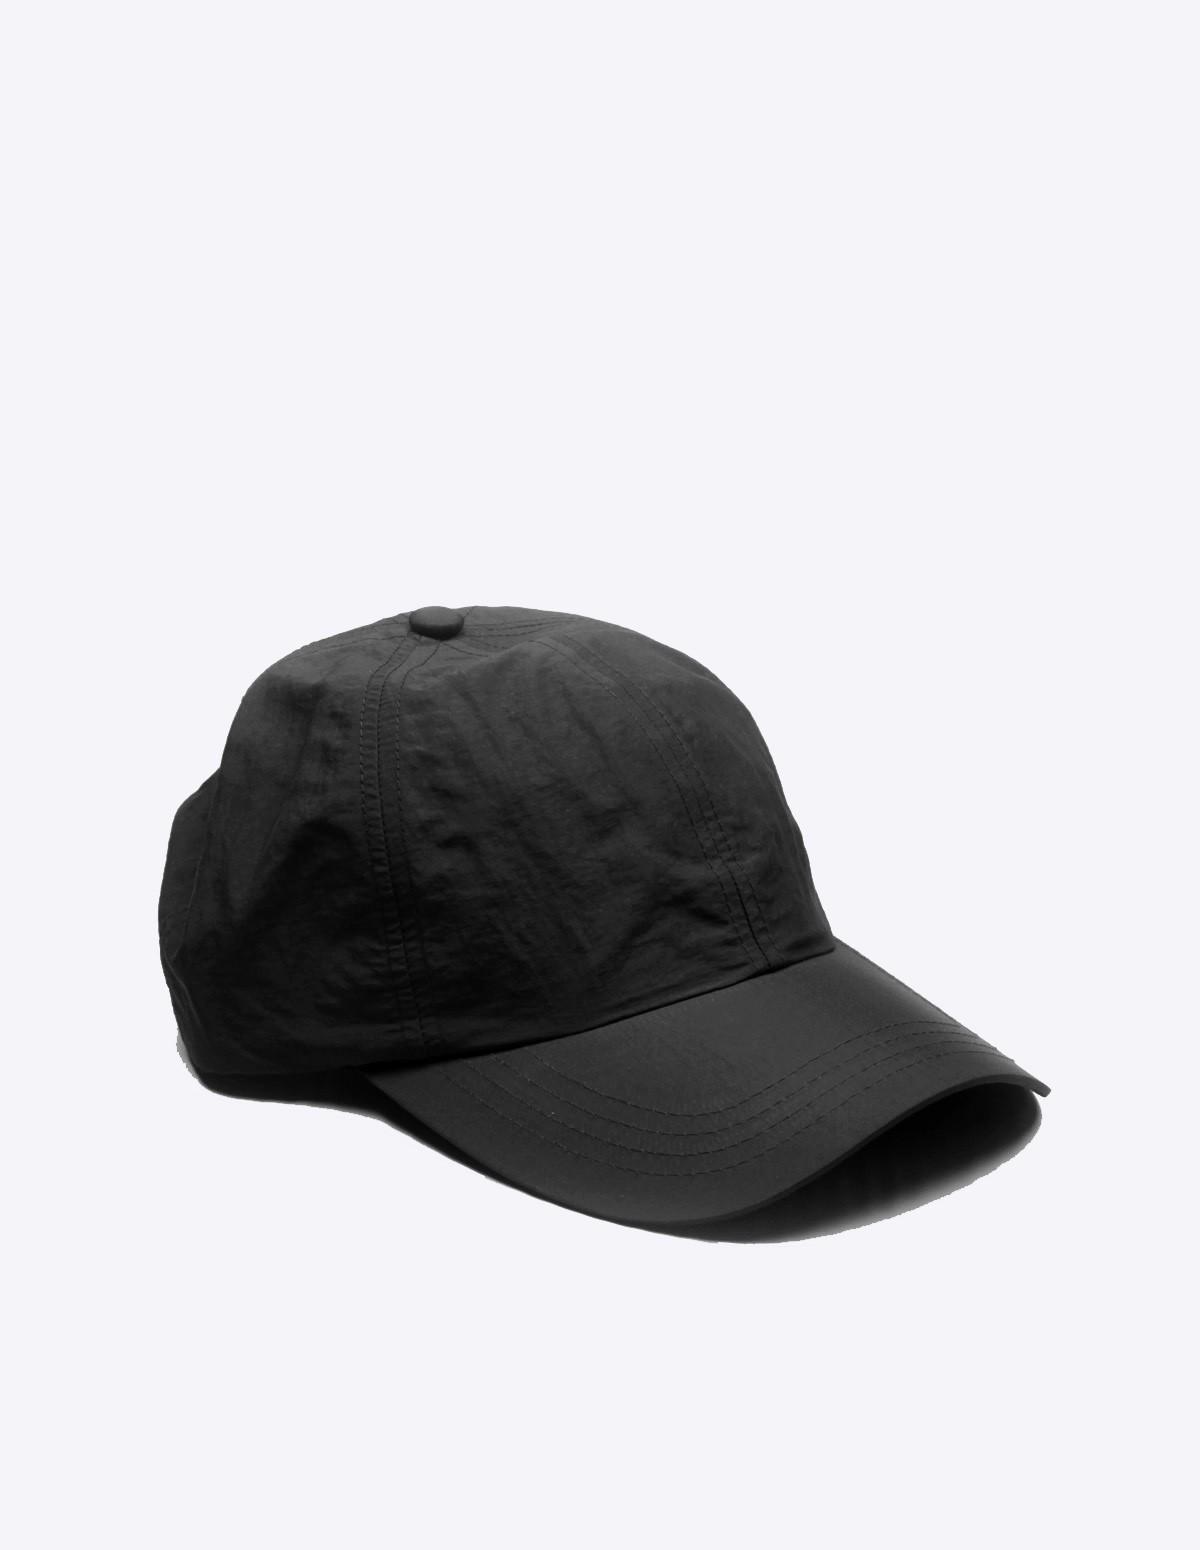 Nn07 Nylon Cap 9153 - BLACK 999